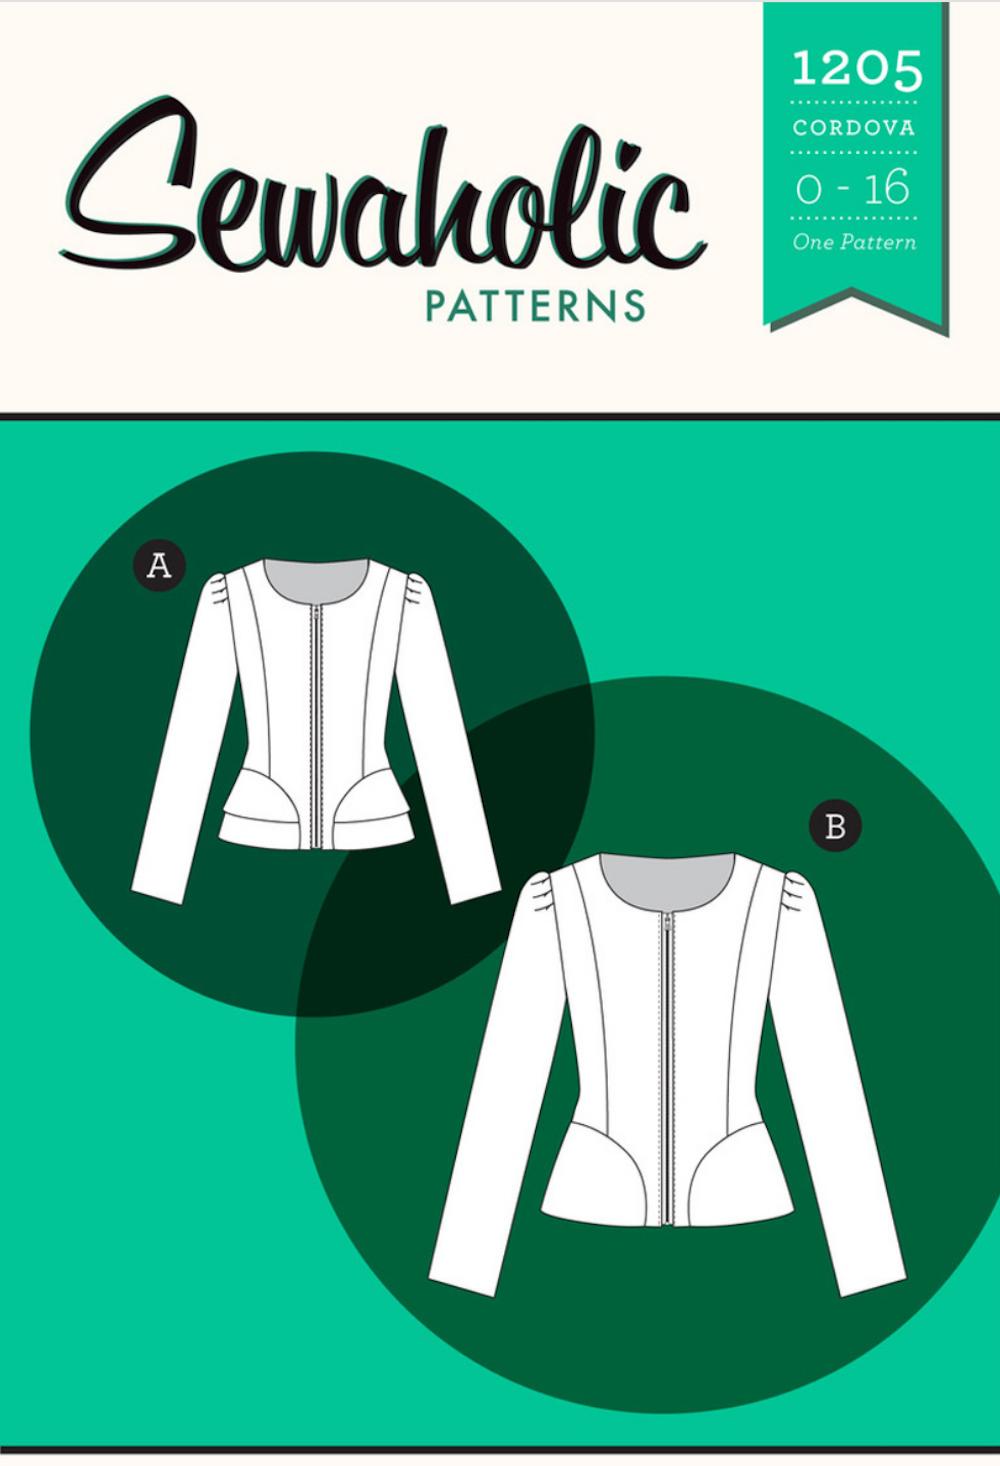 Cordova Jacket - Sewaholic